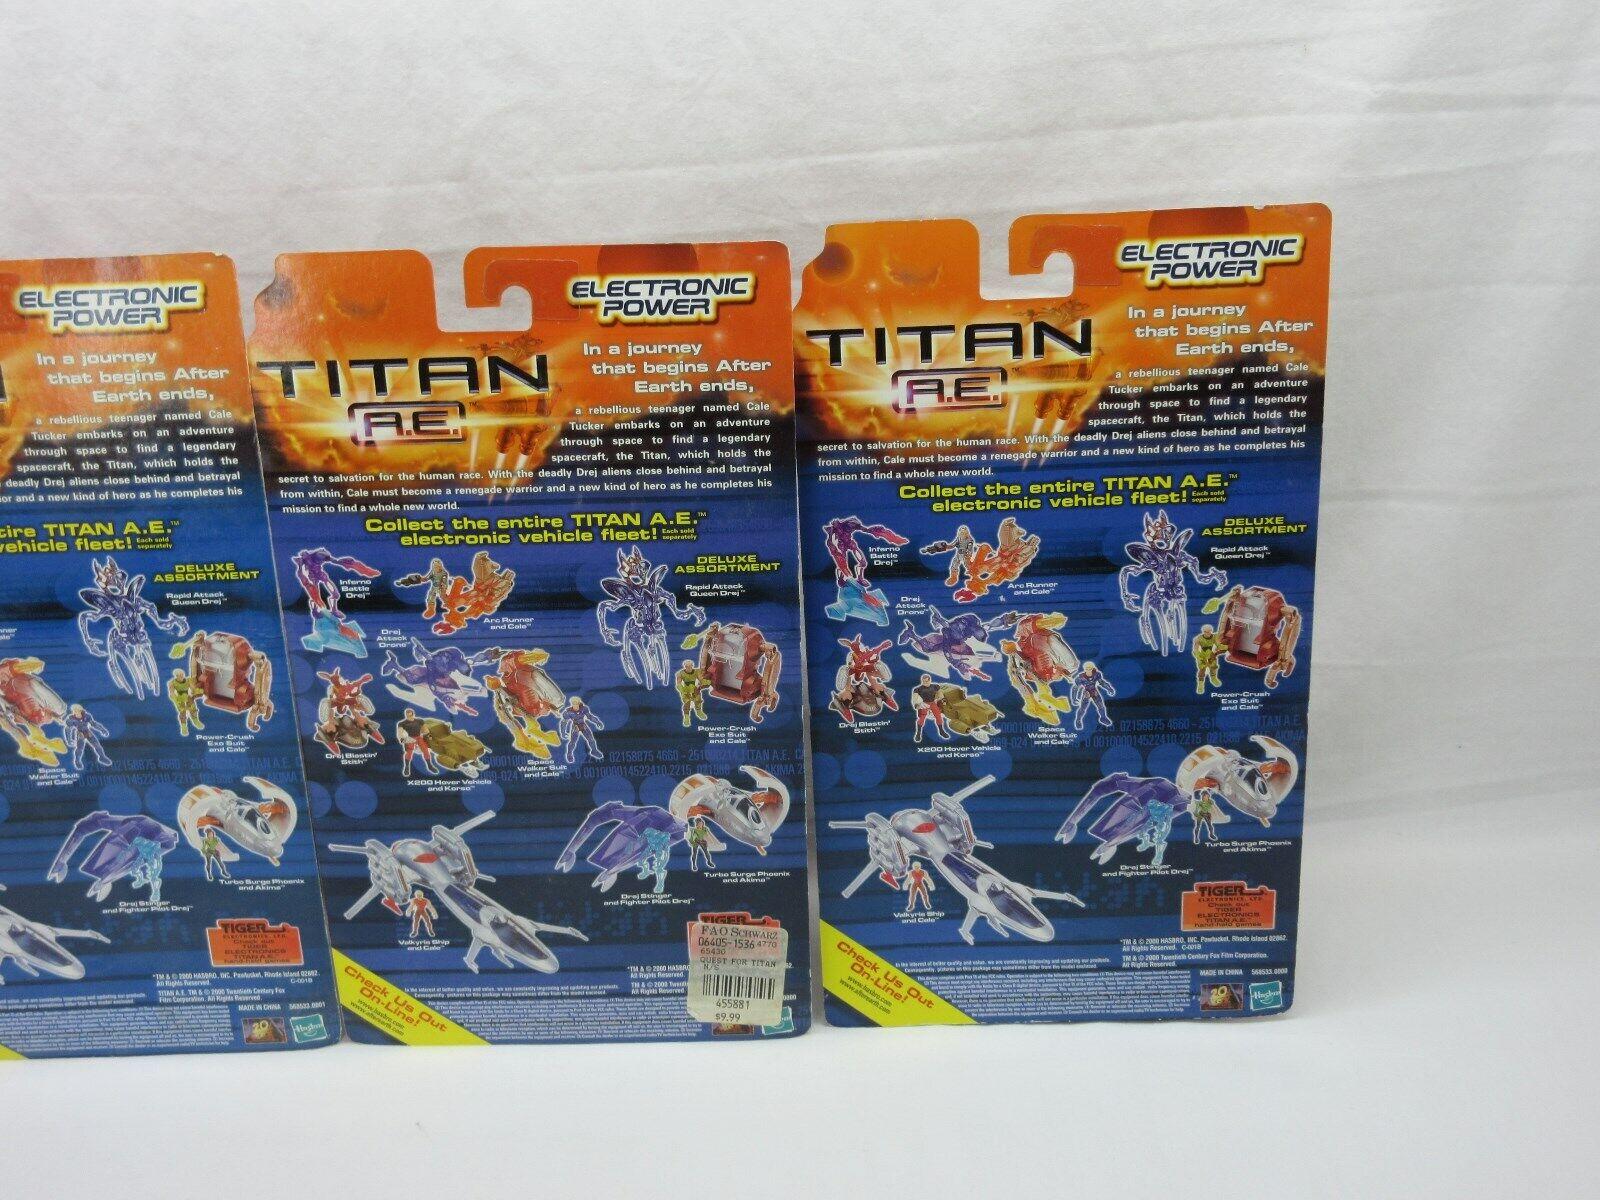 TITAN A.E,Lot of 4 action figures,sealed,MOC,Inferno,Space figures,sealed,MOC,Inferno,Space figures,sealed,MOC,Inferno,Space Walker,Stith,Cale 242441